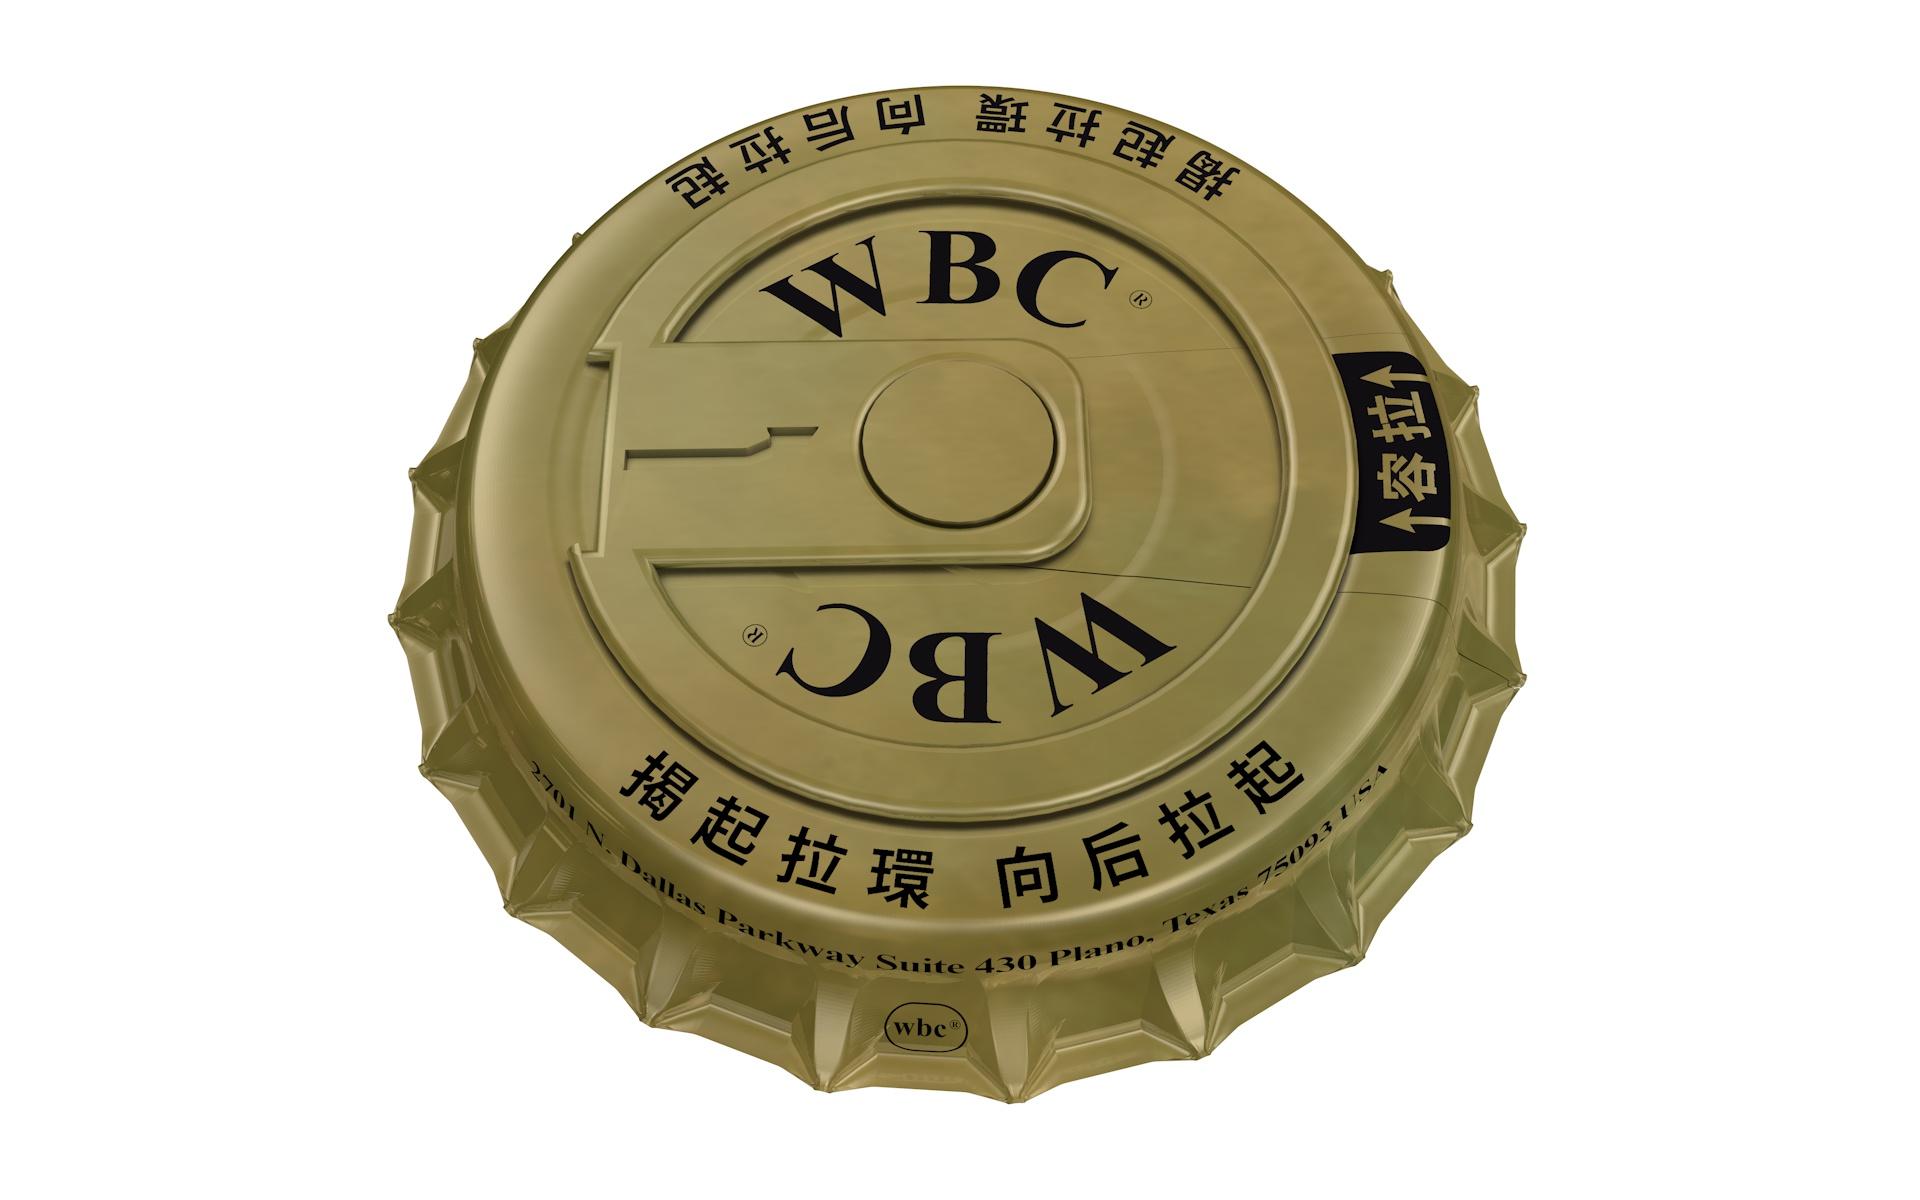 epbc-wbc-lift-ar-chi-002_0000